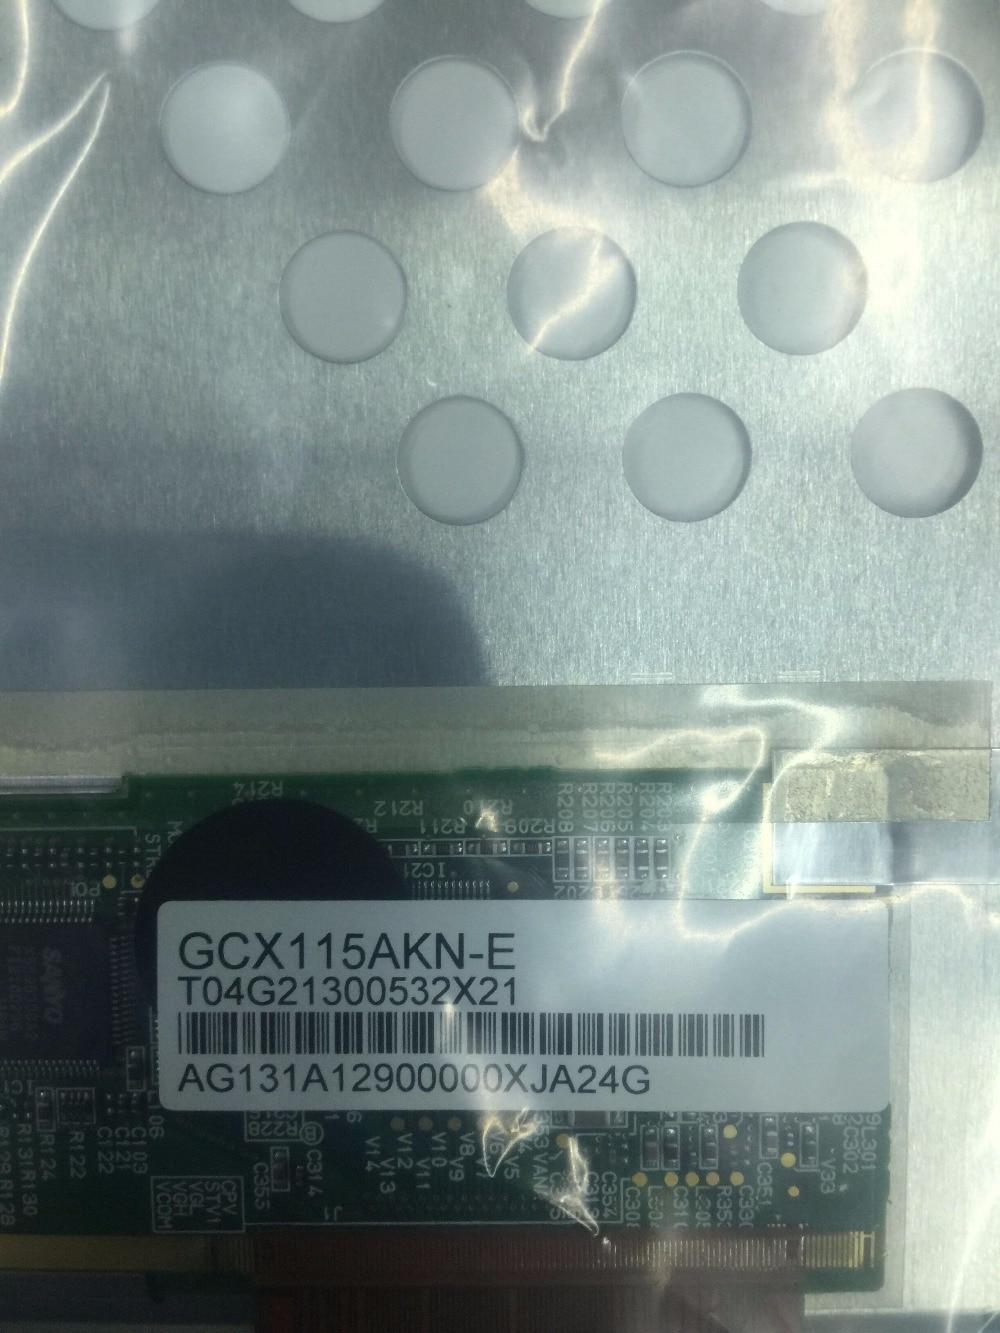 NEW Original A+ Grade 13.3 Inch GCX115AKN-E  GCX115AKN 1280*800 TFT LCD DISPLAY MODULE LCD Panel 12 Months Warranty